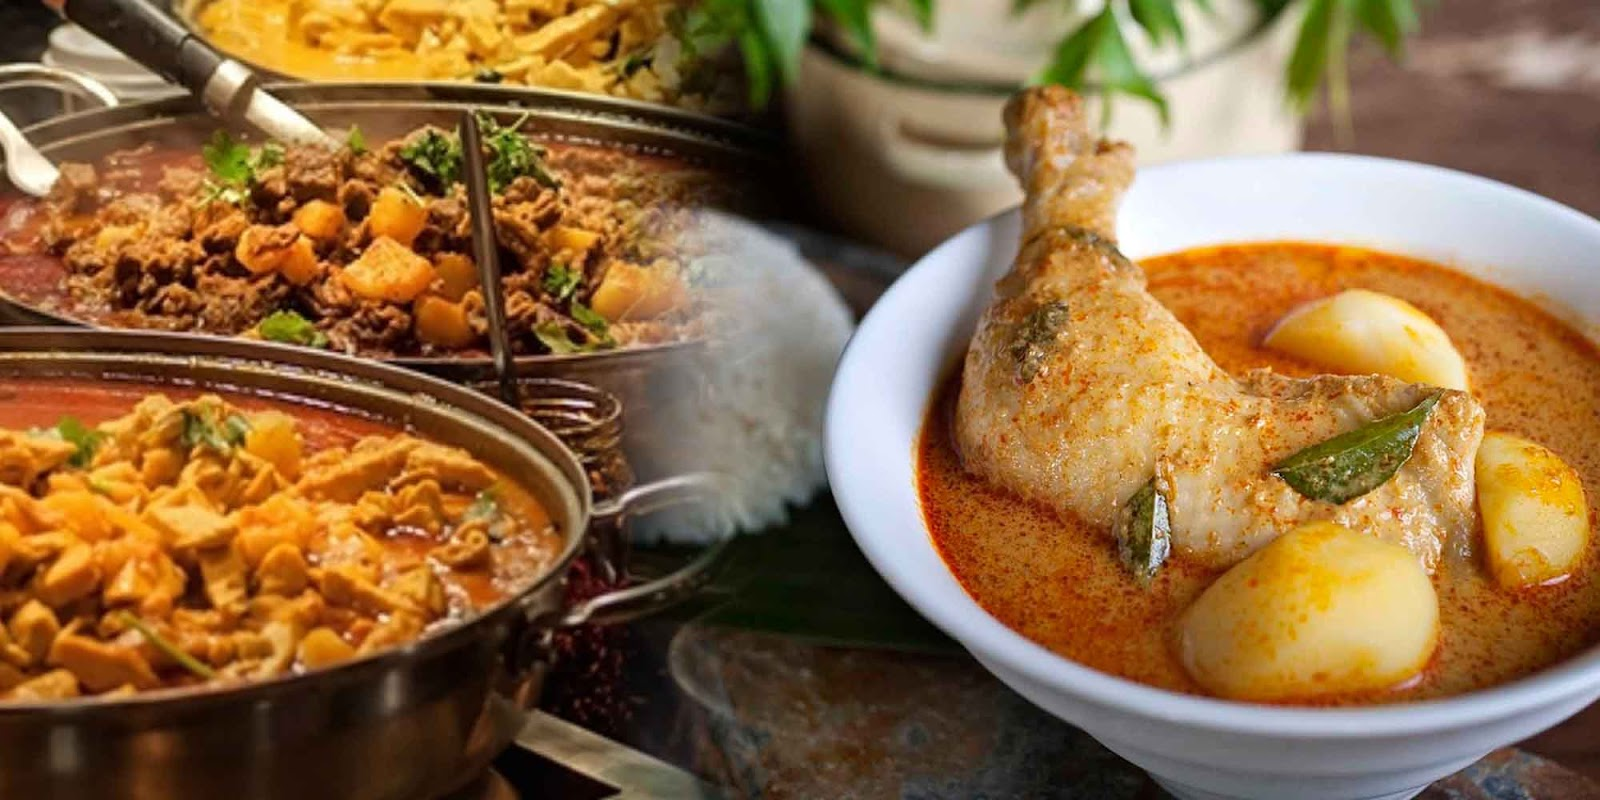 Deccan spice authentic indian cuisine for Authentic indian cuisine